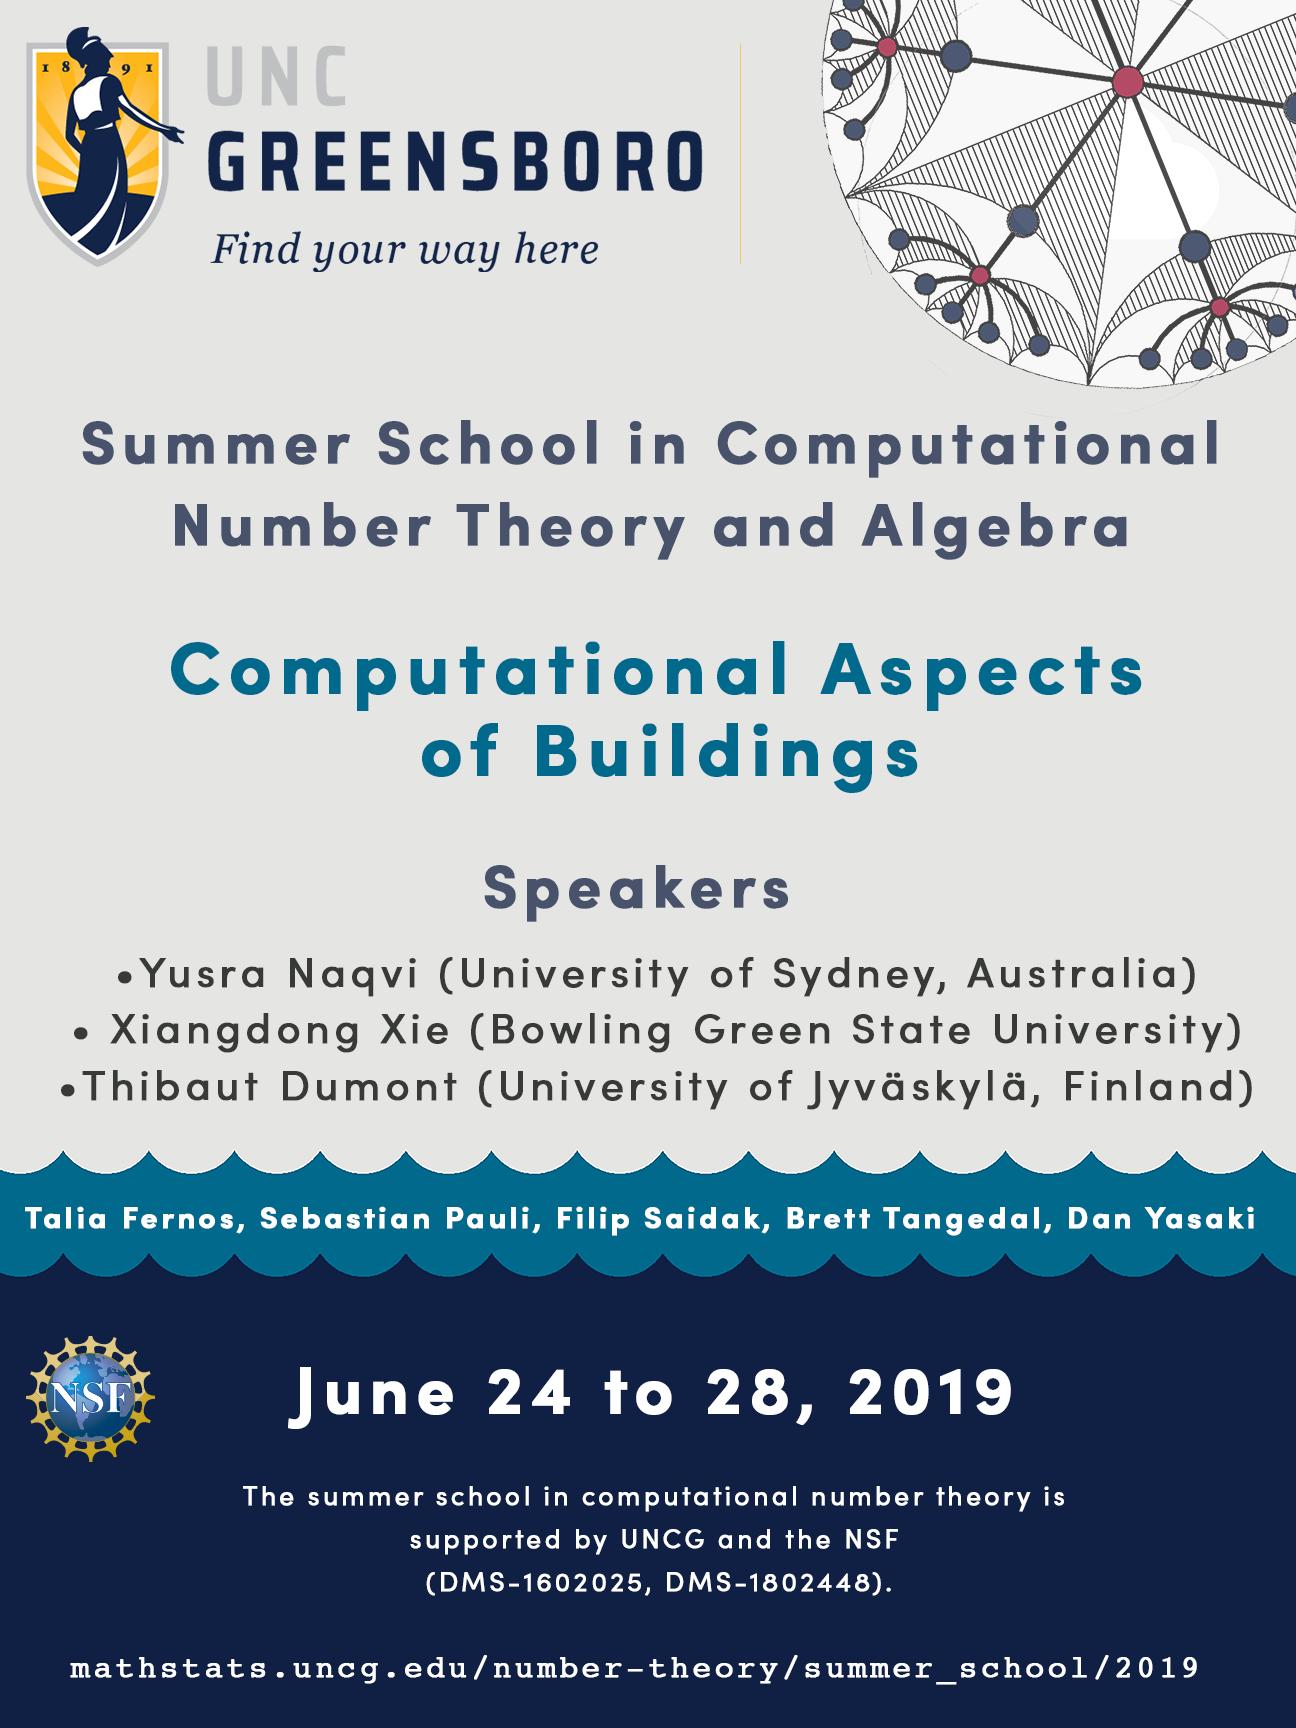 Uncg Spring 2022 Calendar.Summer School 2019 Computational Aspects Of Buildings